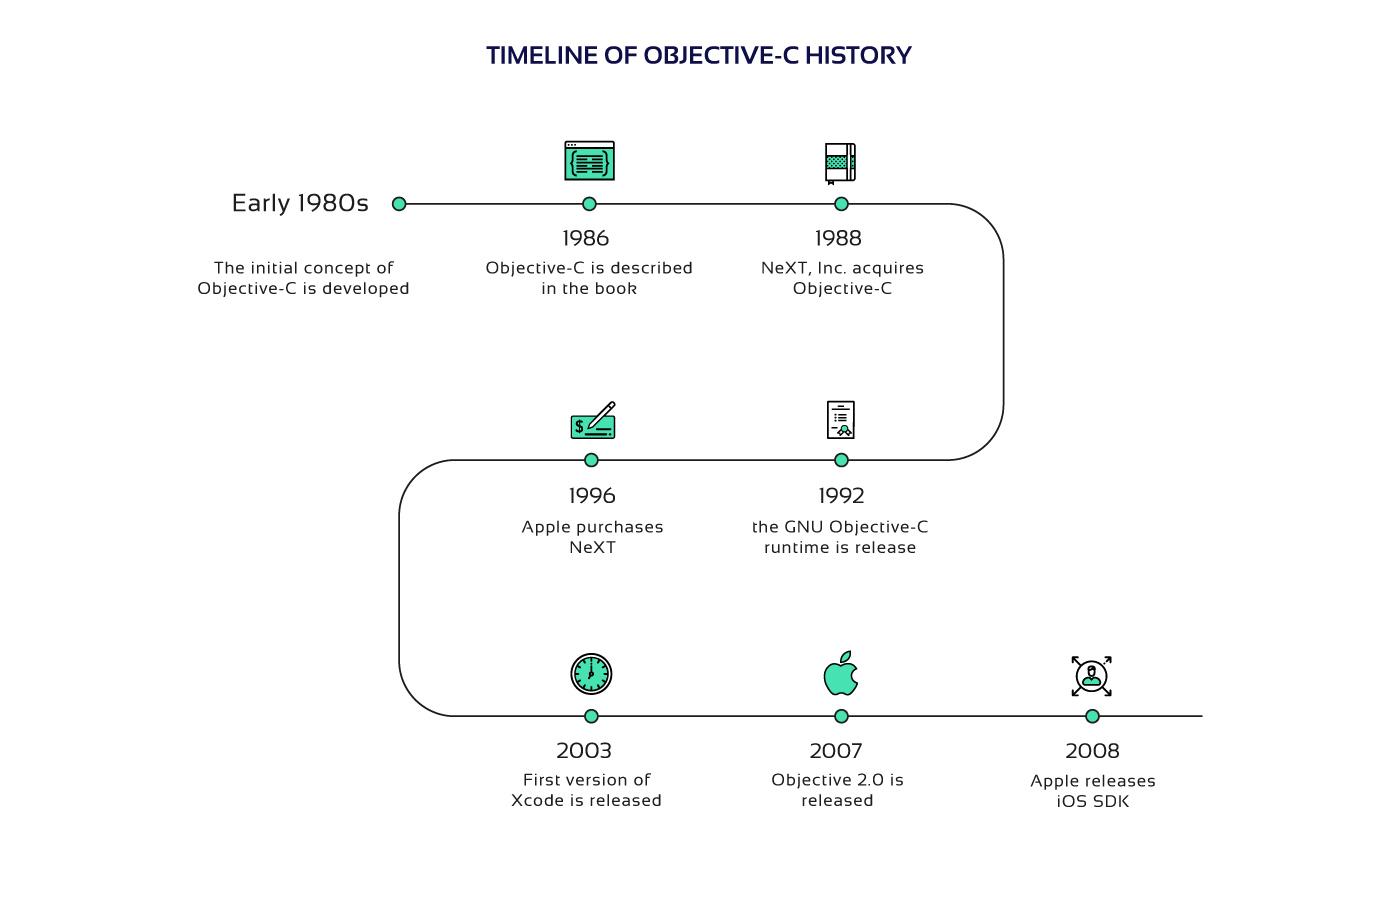 Objective-C timeline